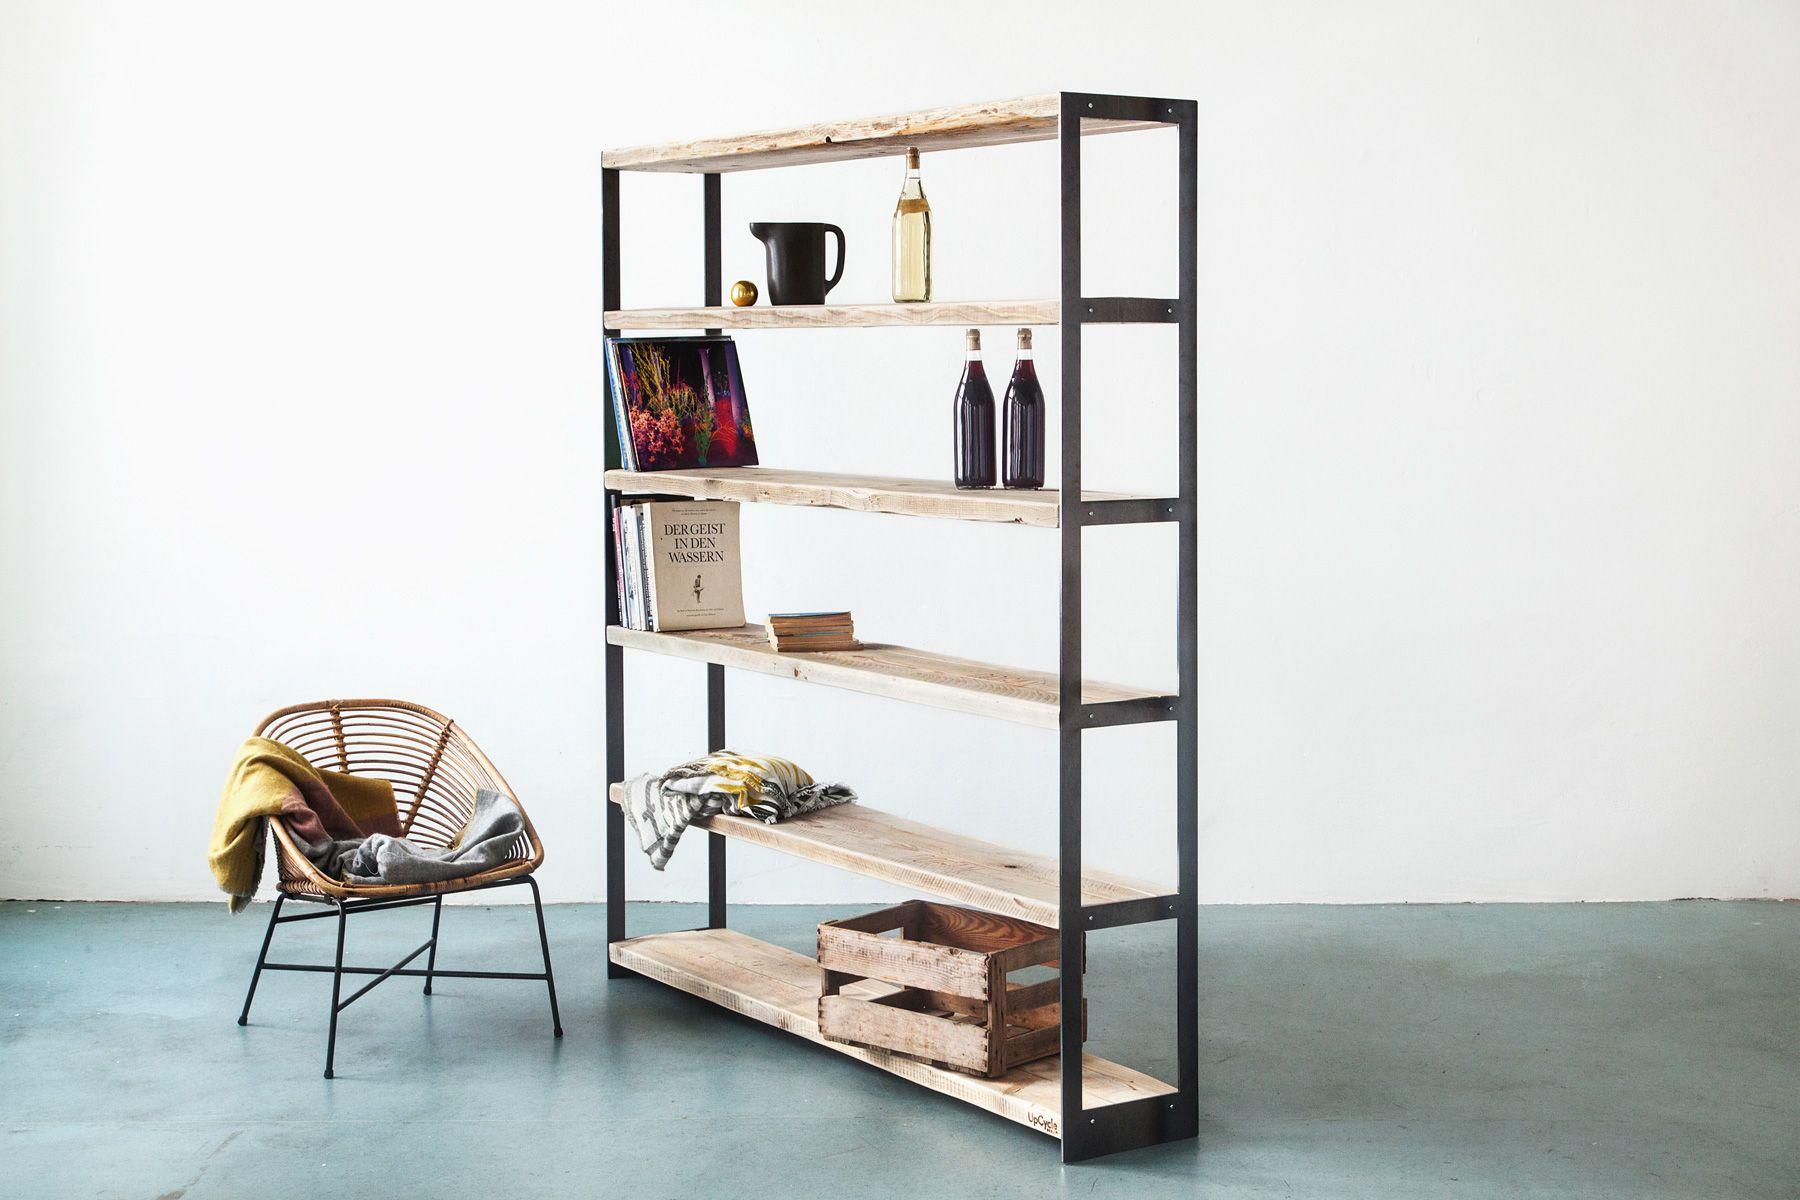 Palindrom Store In 2020 Bucherregal Raumteiler Raumteiler Regal